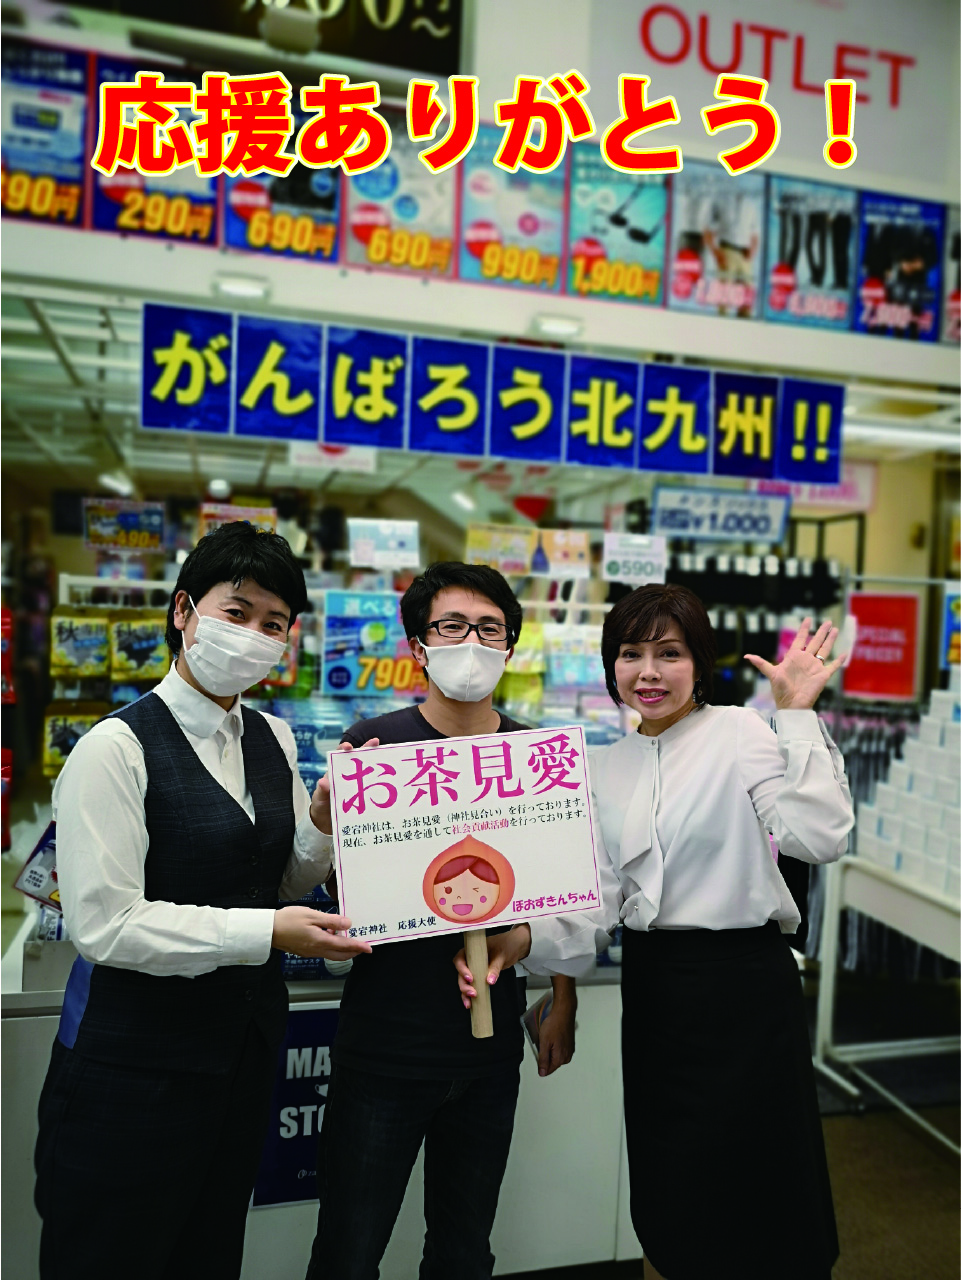 fukuoka-lp2_20210527_2-art-14-80